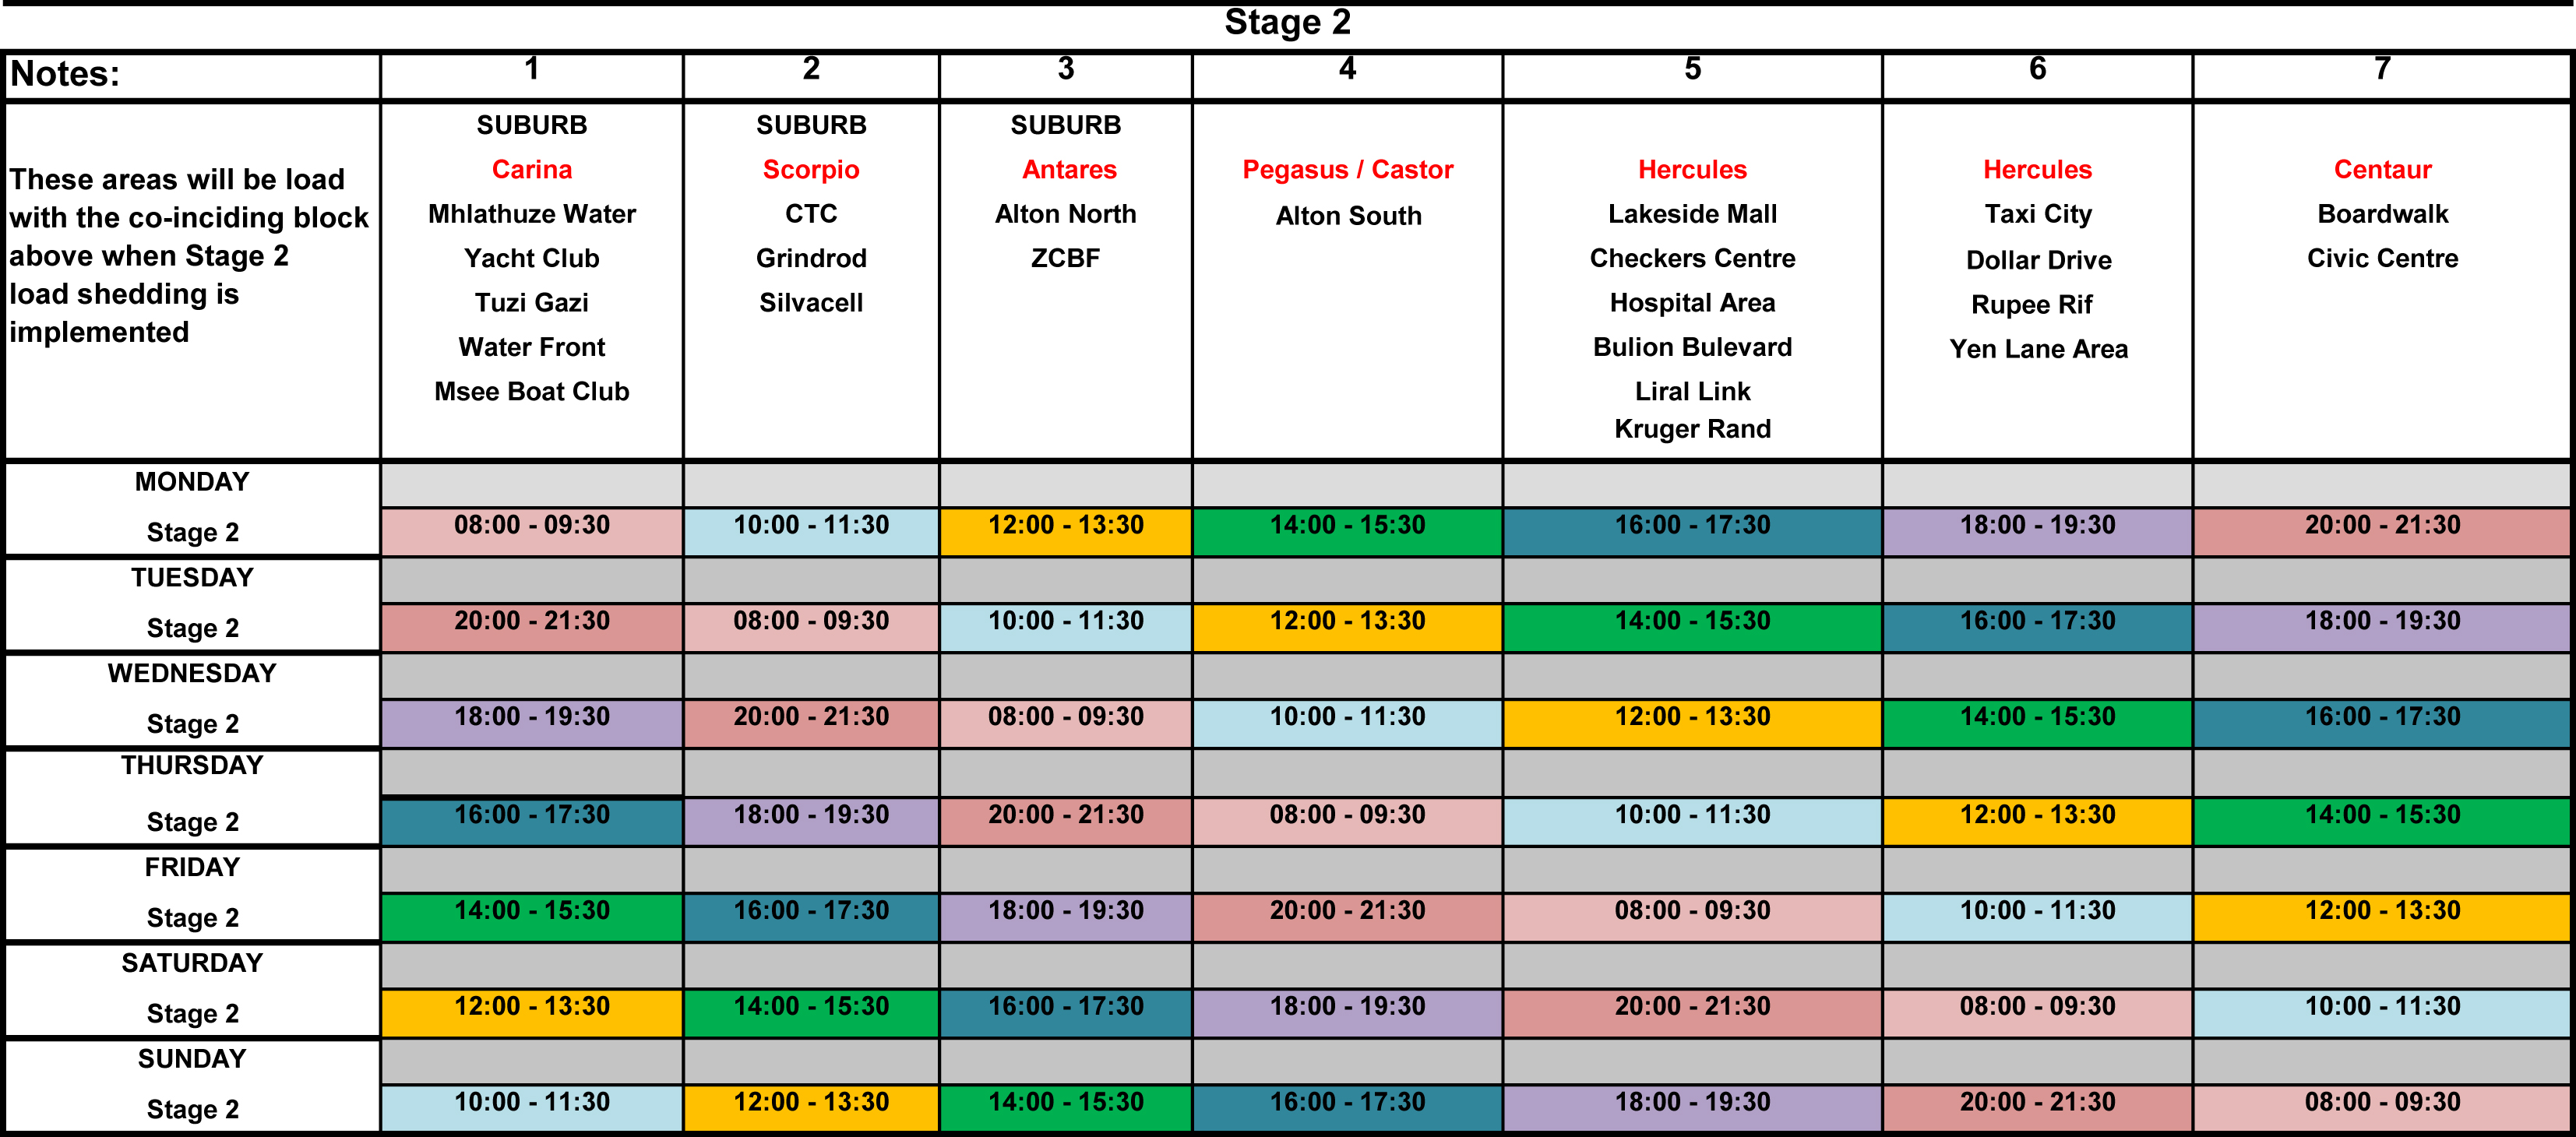 Loadshedding Schedule Hd: New Load Shedding Schedule For UMhlathuze